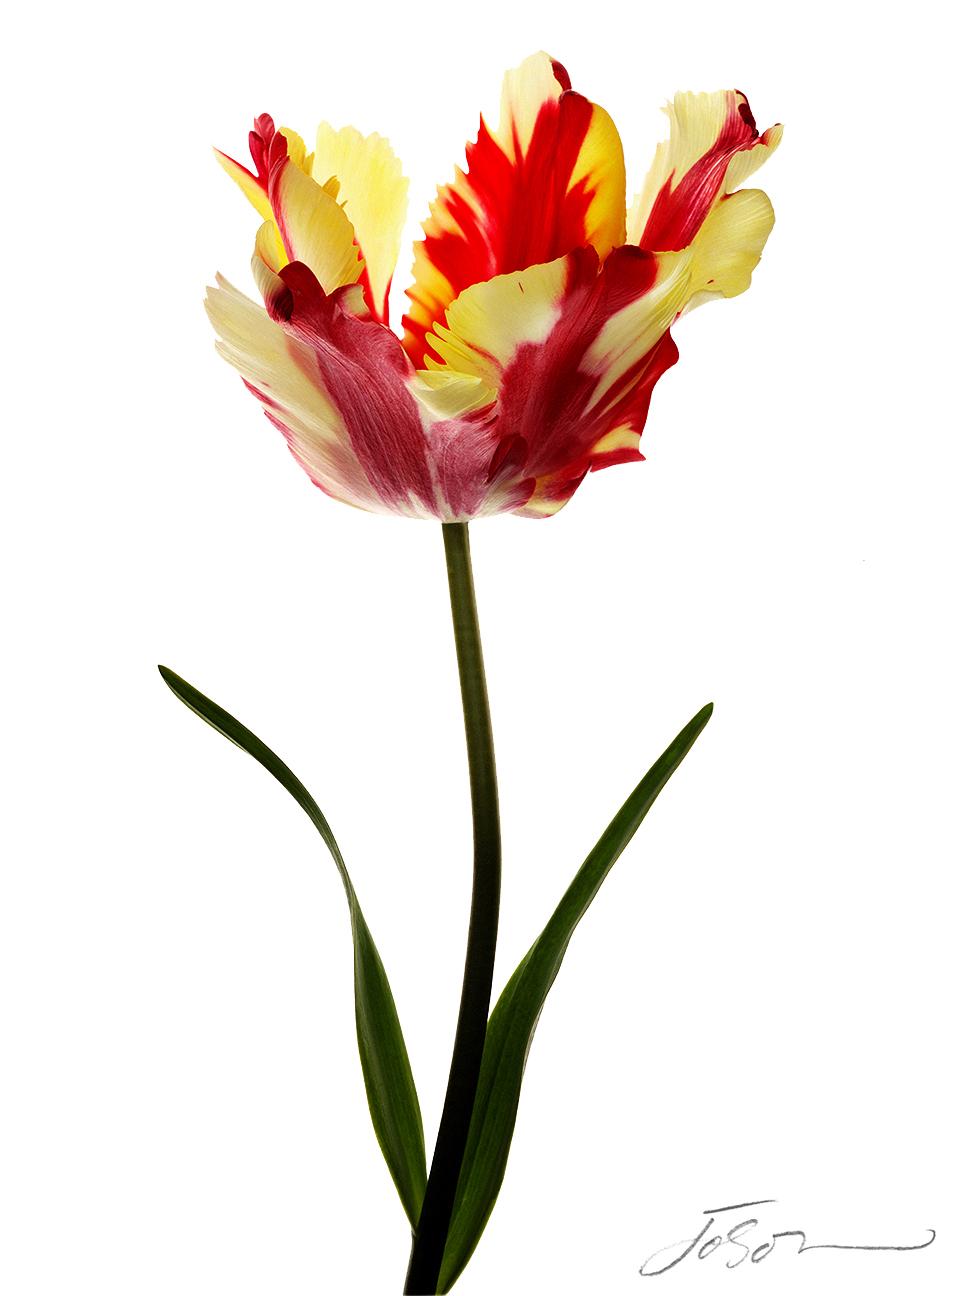 Texas Flame Tulip (Tulipa)